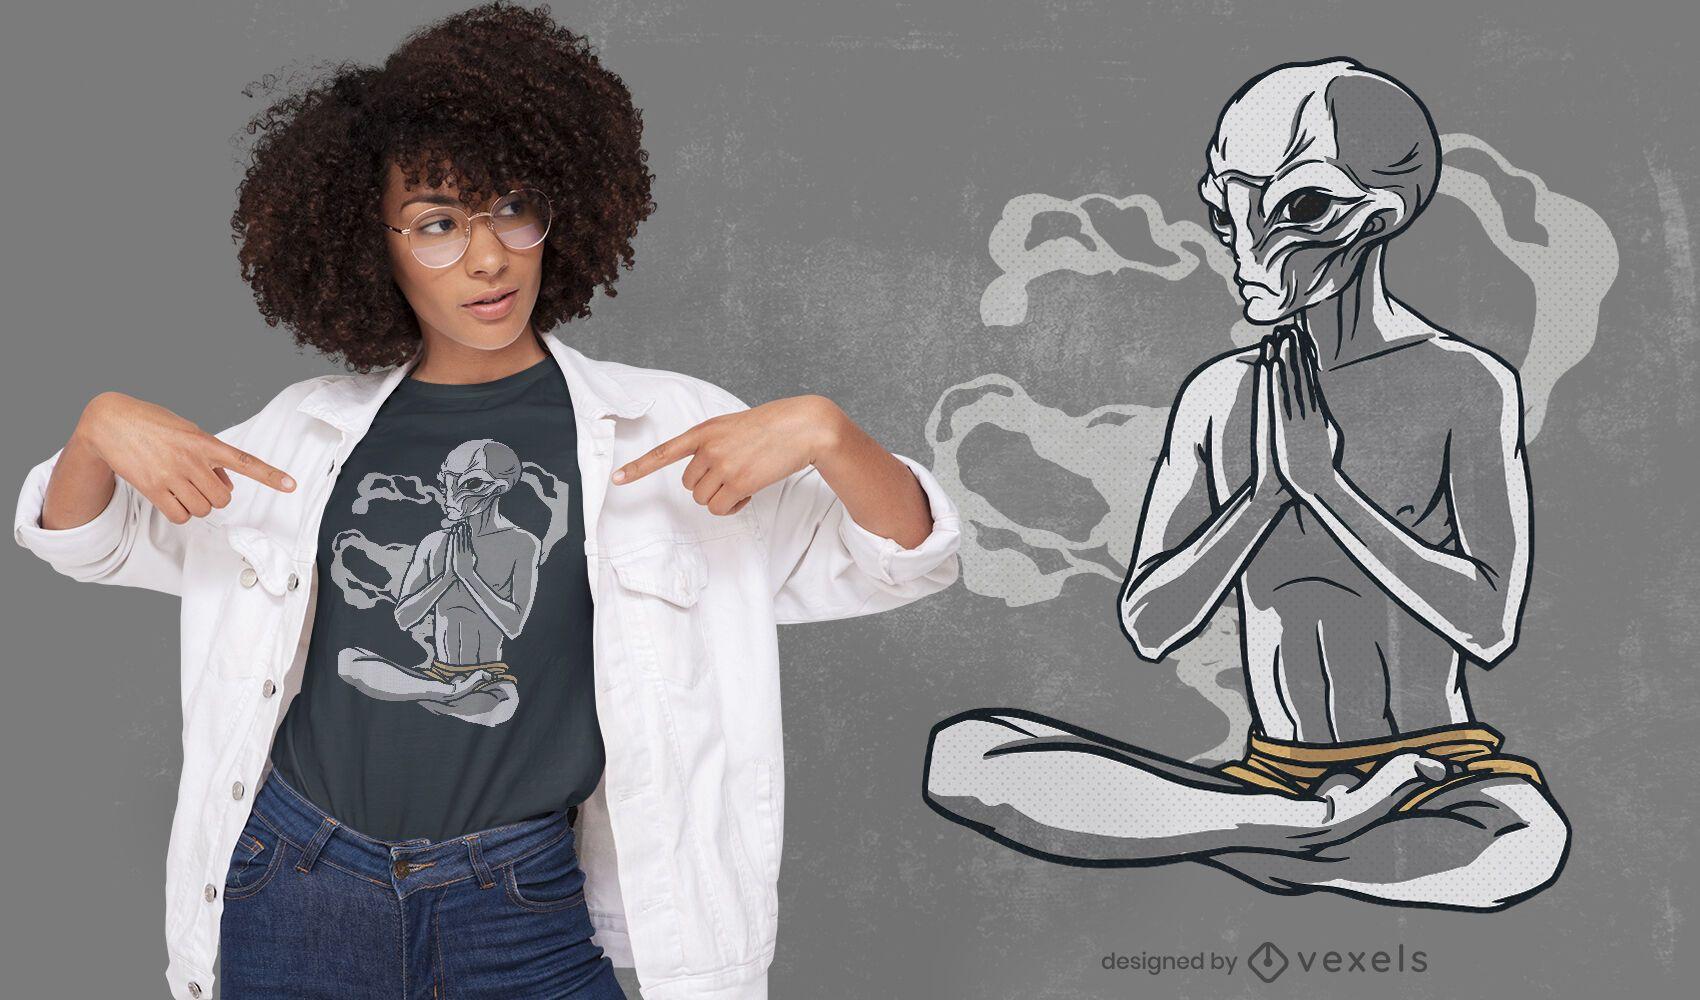 Design de t-shirt alienígena para ioga